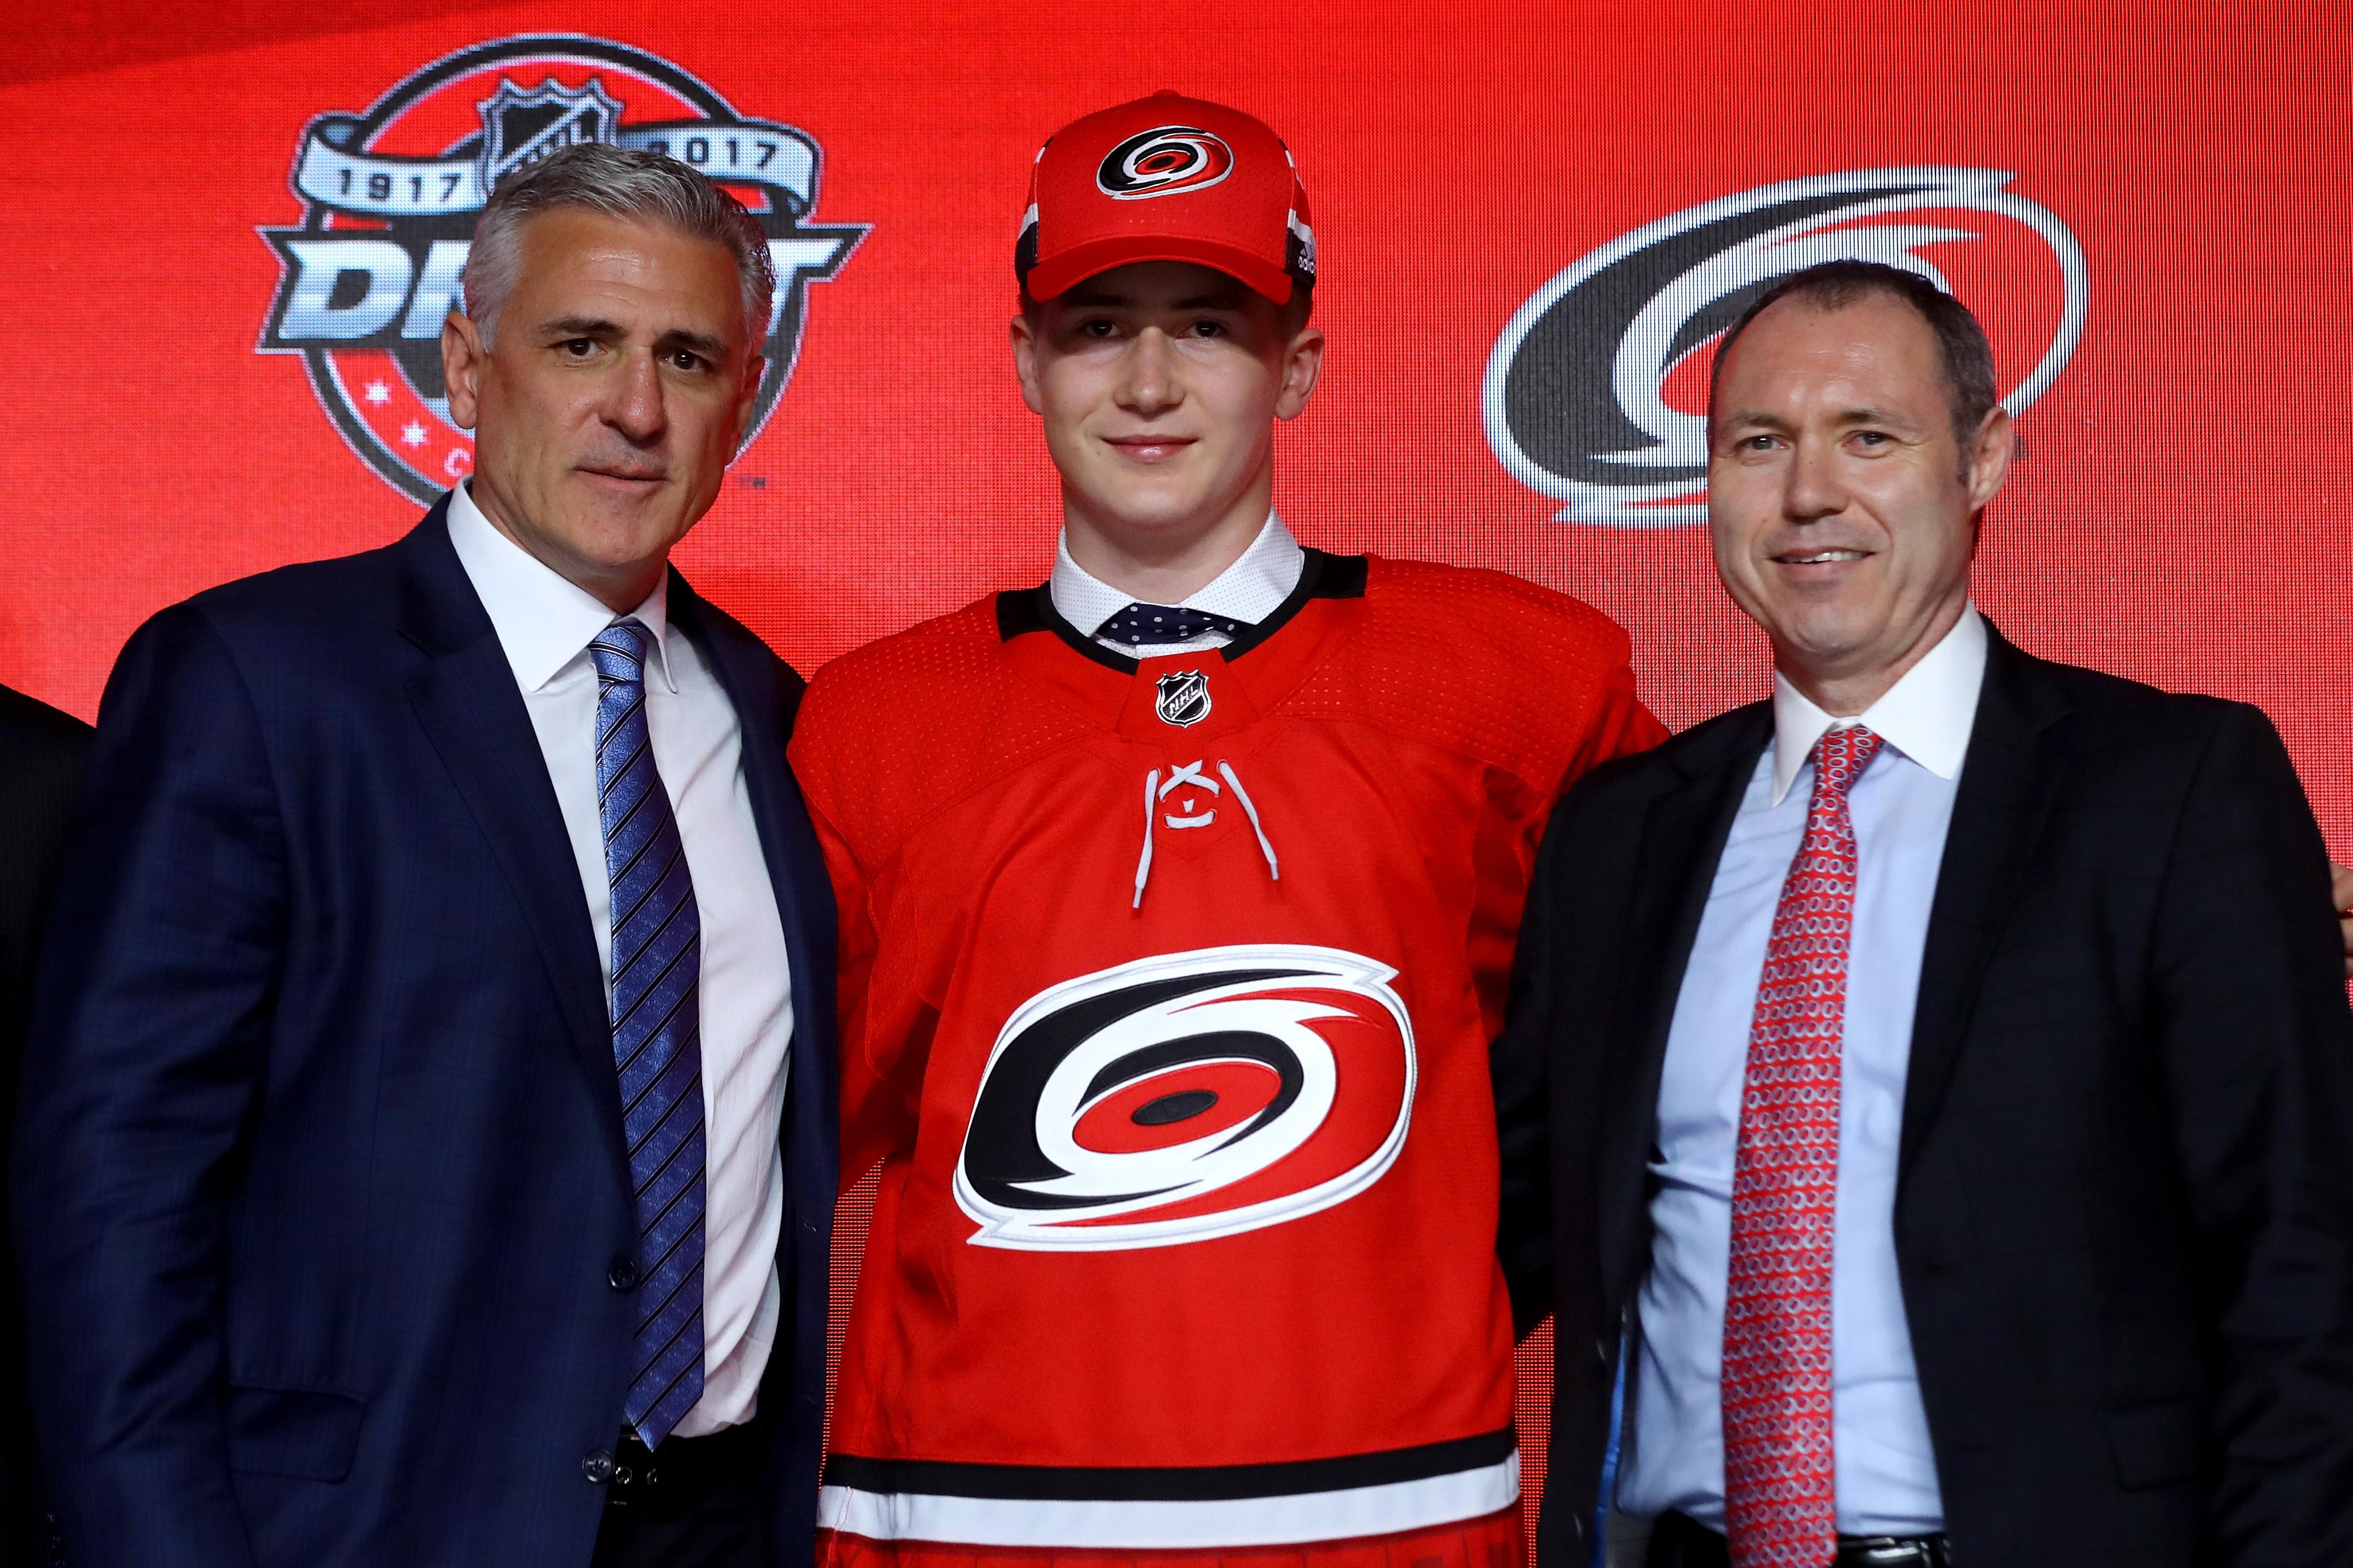 2017 NHL Draft - Round One